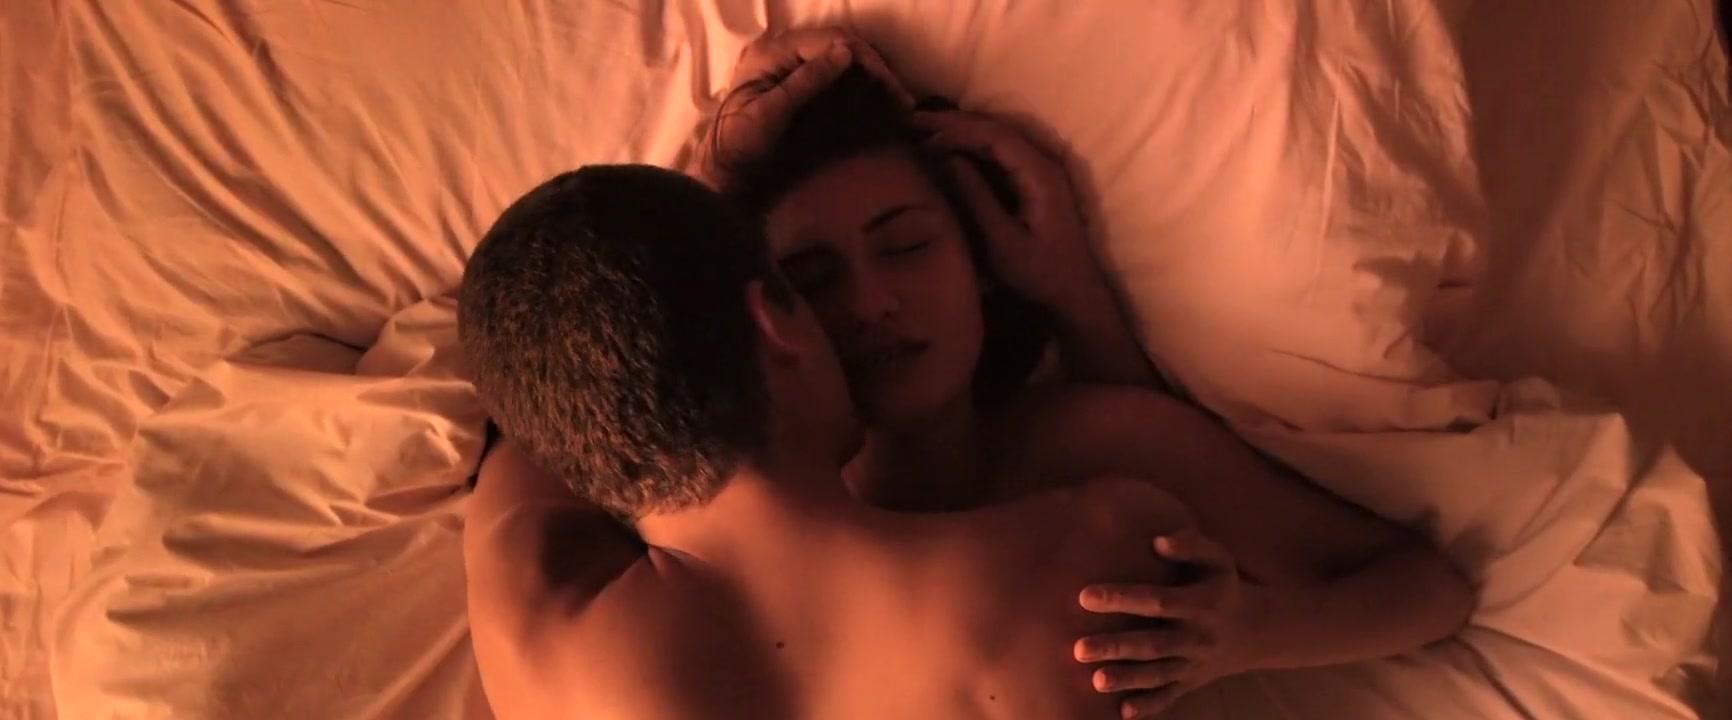 Porno lesbian strapon Adult videos